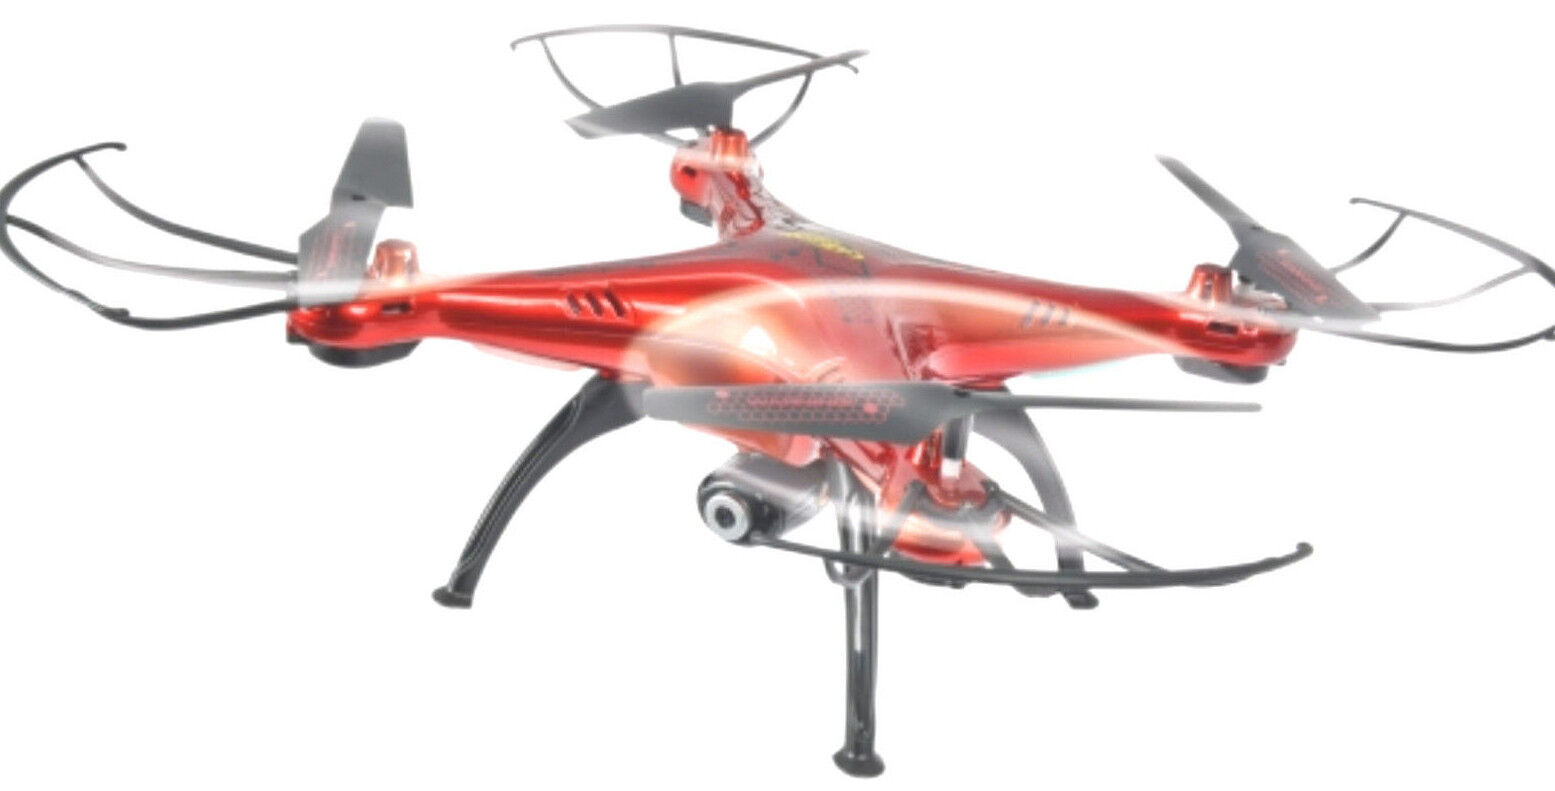 Carson 500507122 x4 quadcopter 360 3d FPV 2.4 GHz RTF